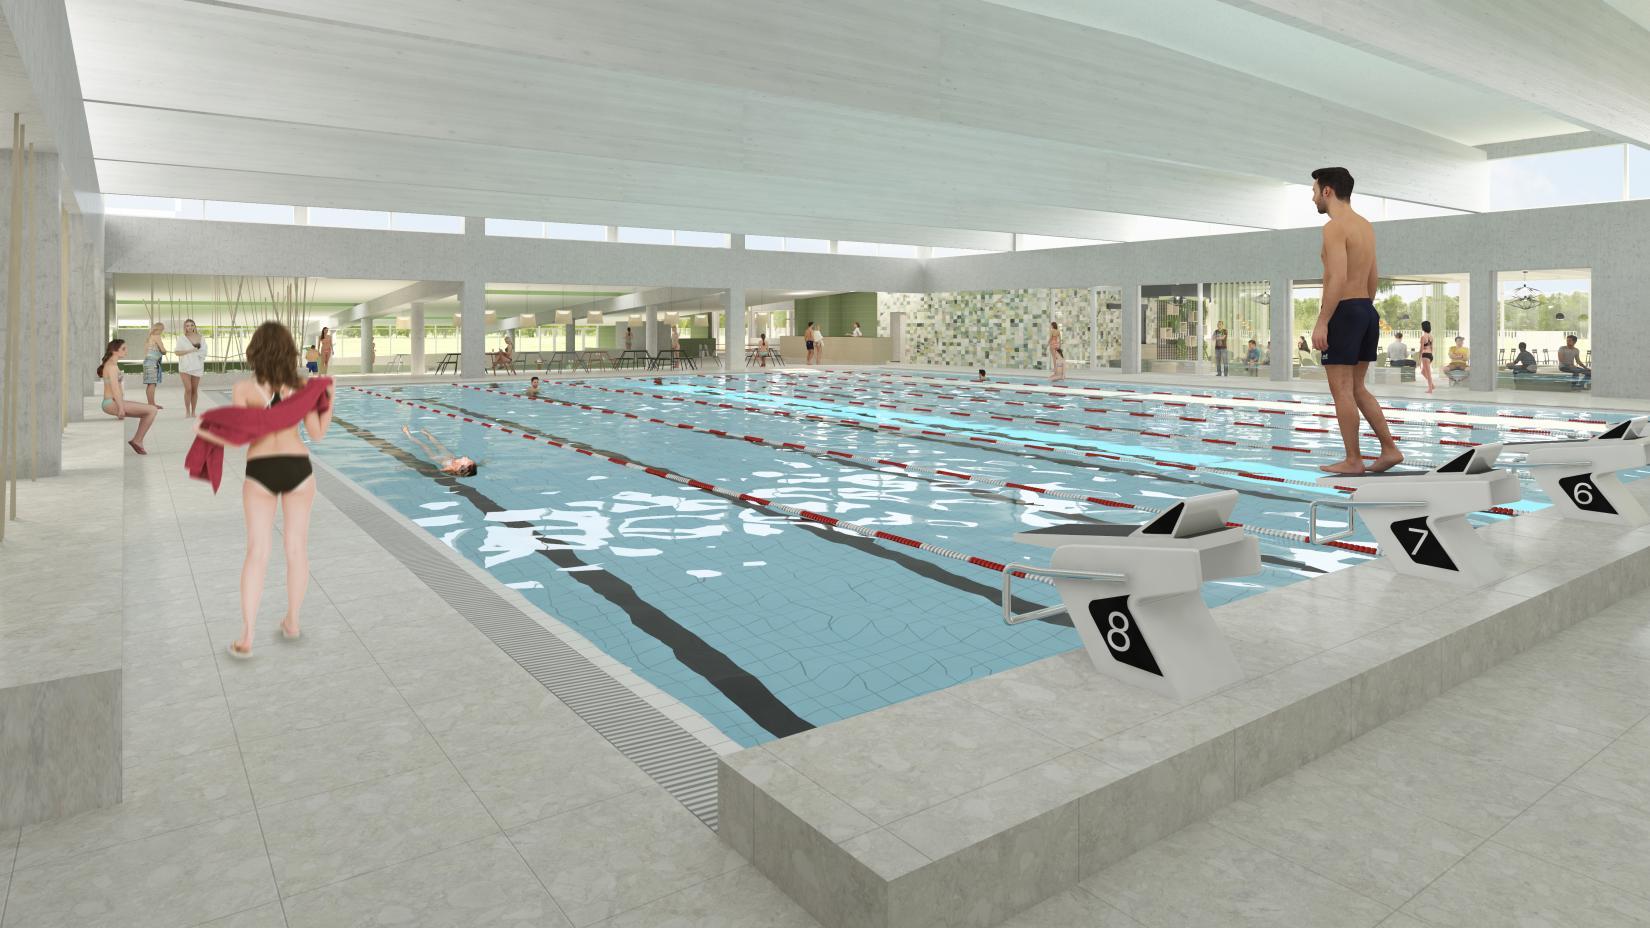 Zwembad Sint-Truiden